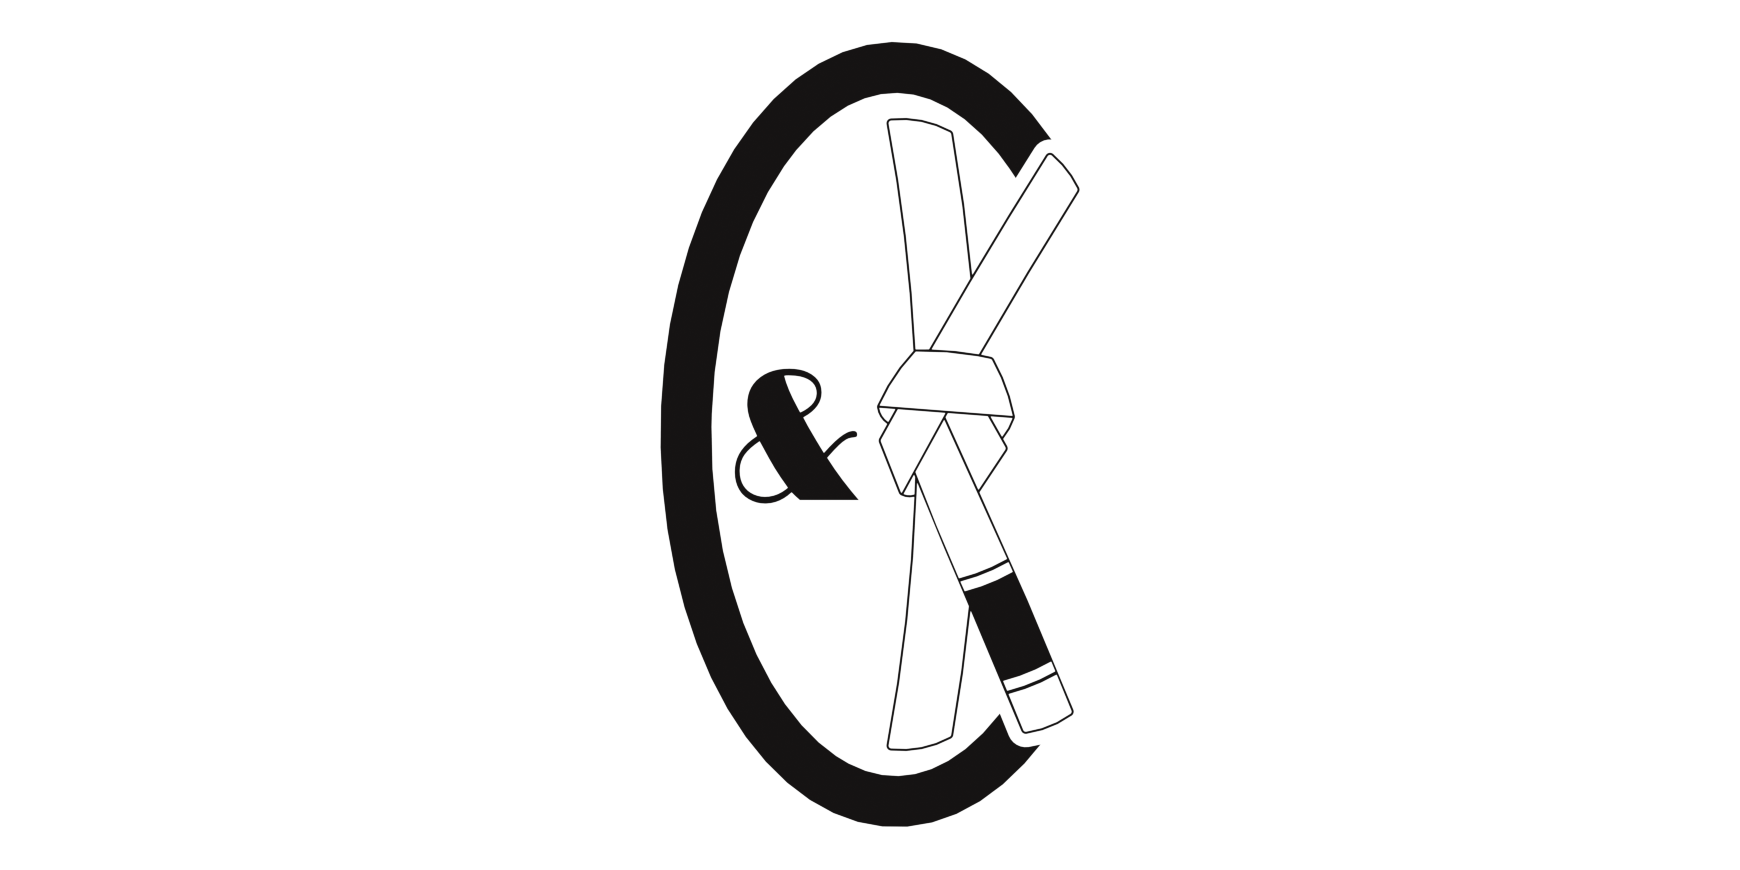 Coffee&Kimuras - Brand logo created for Irish martial arts apparel brand, Coffee&Kimuras.